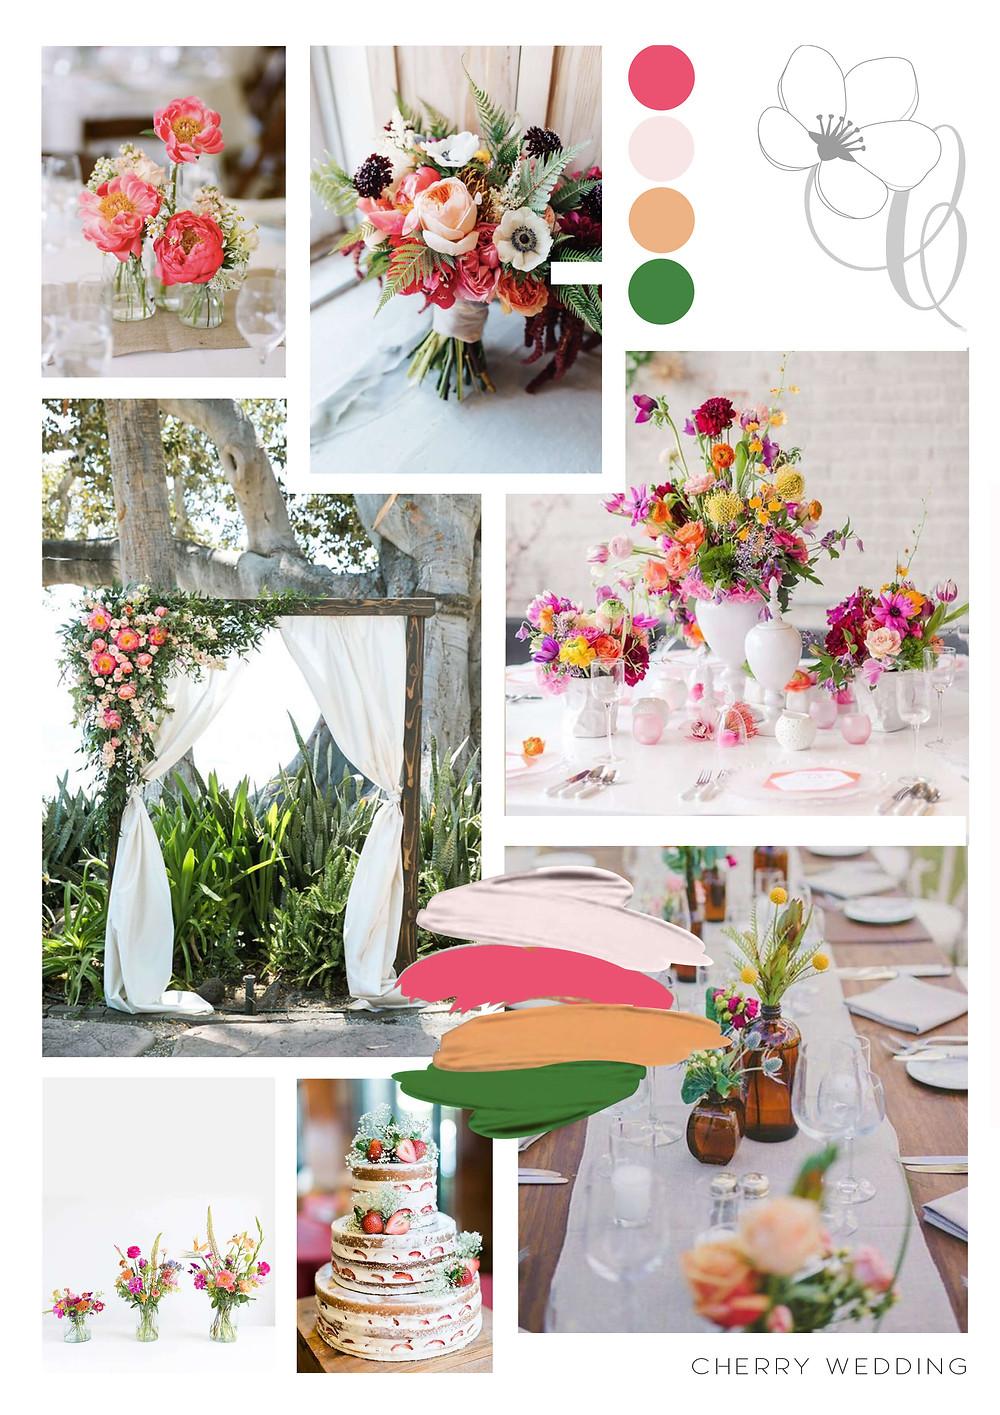 moldboard-cherry-wedding-mariage-champetre-vintage